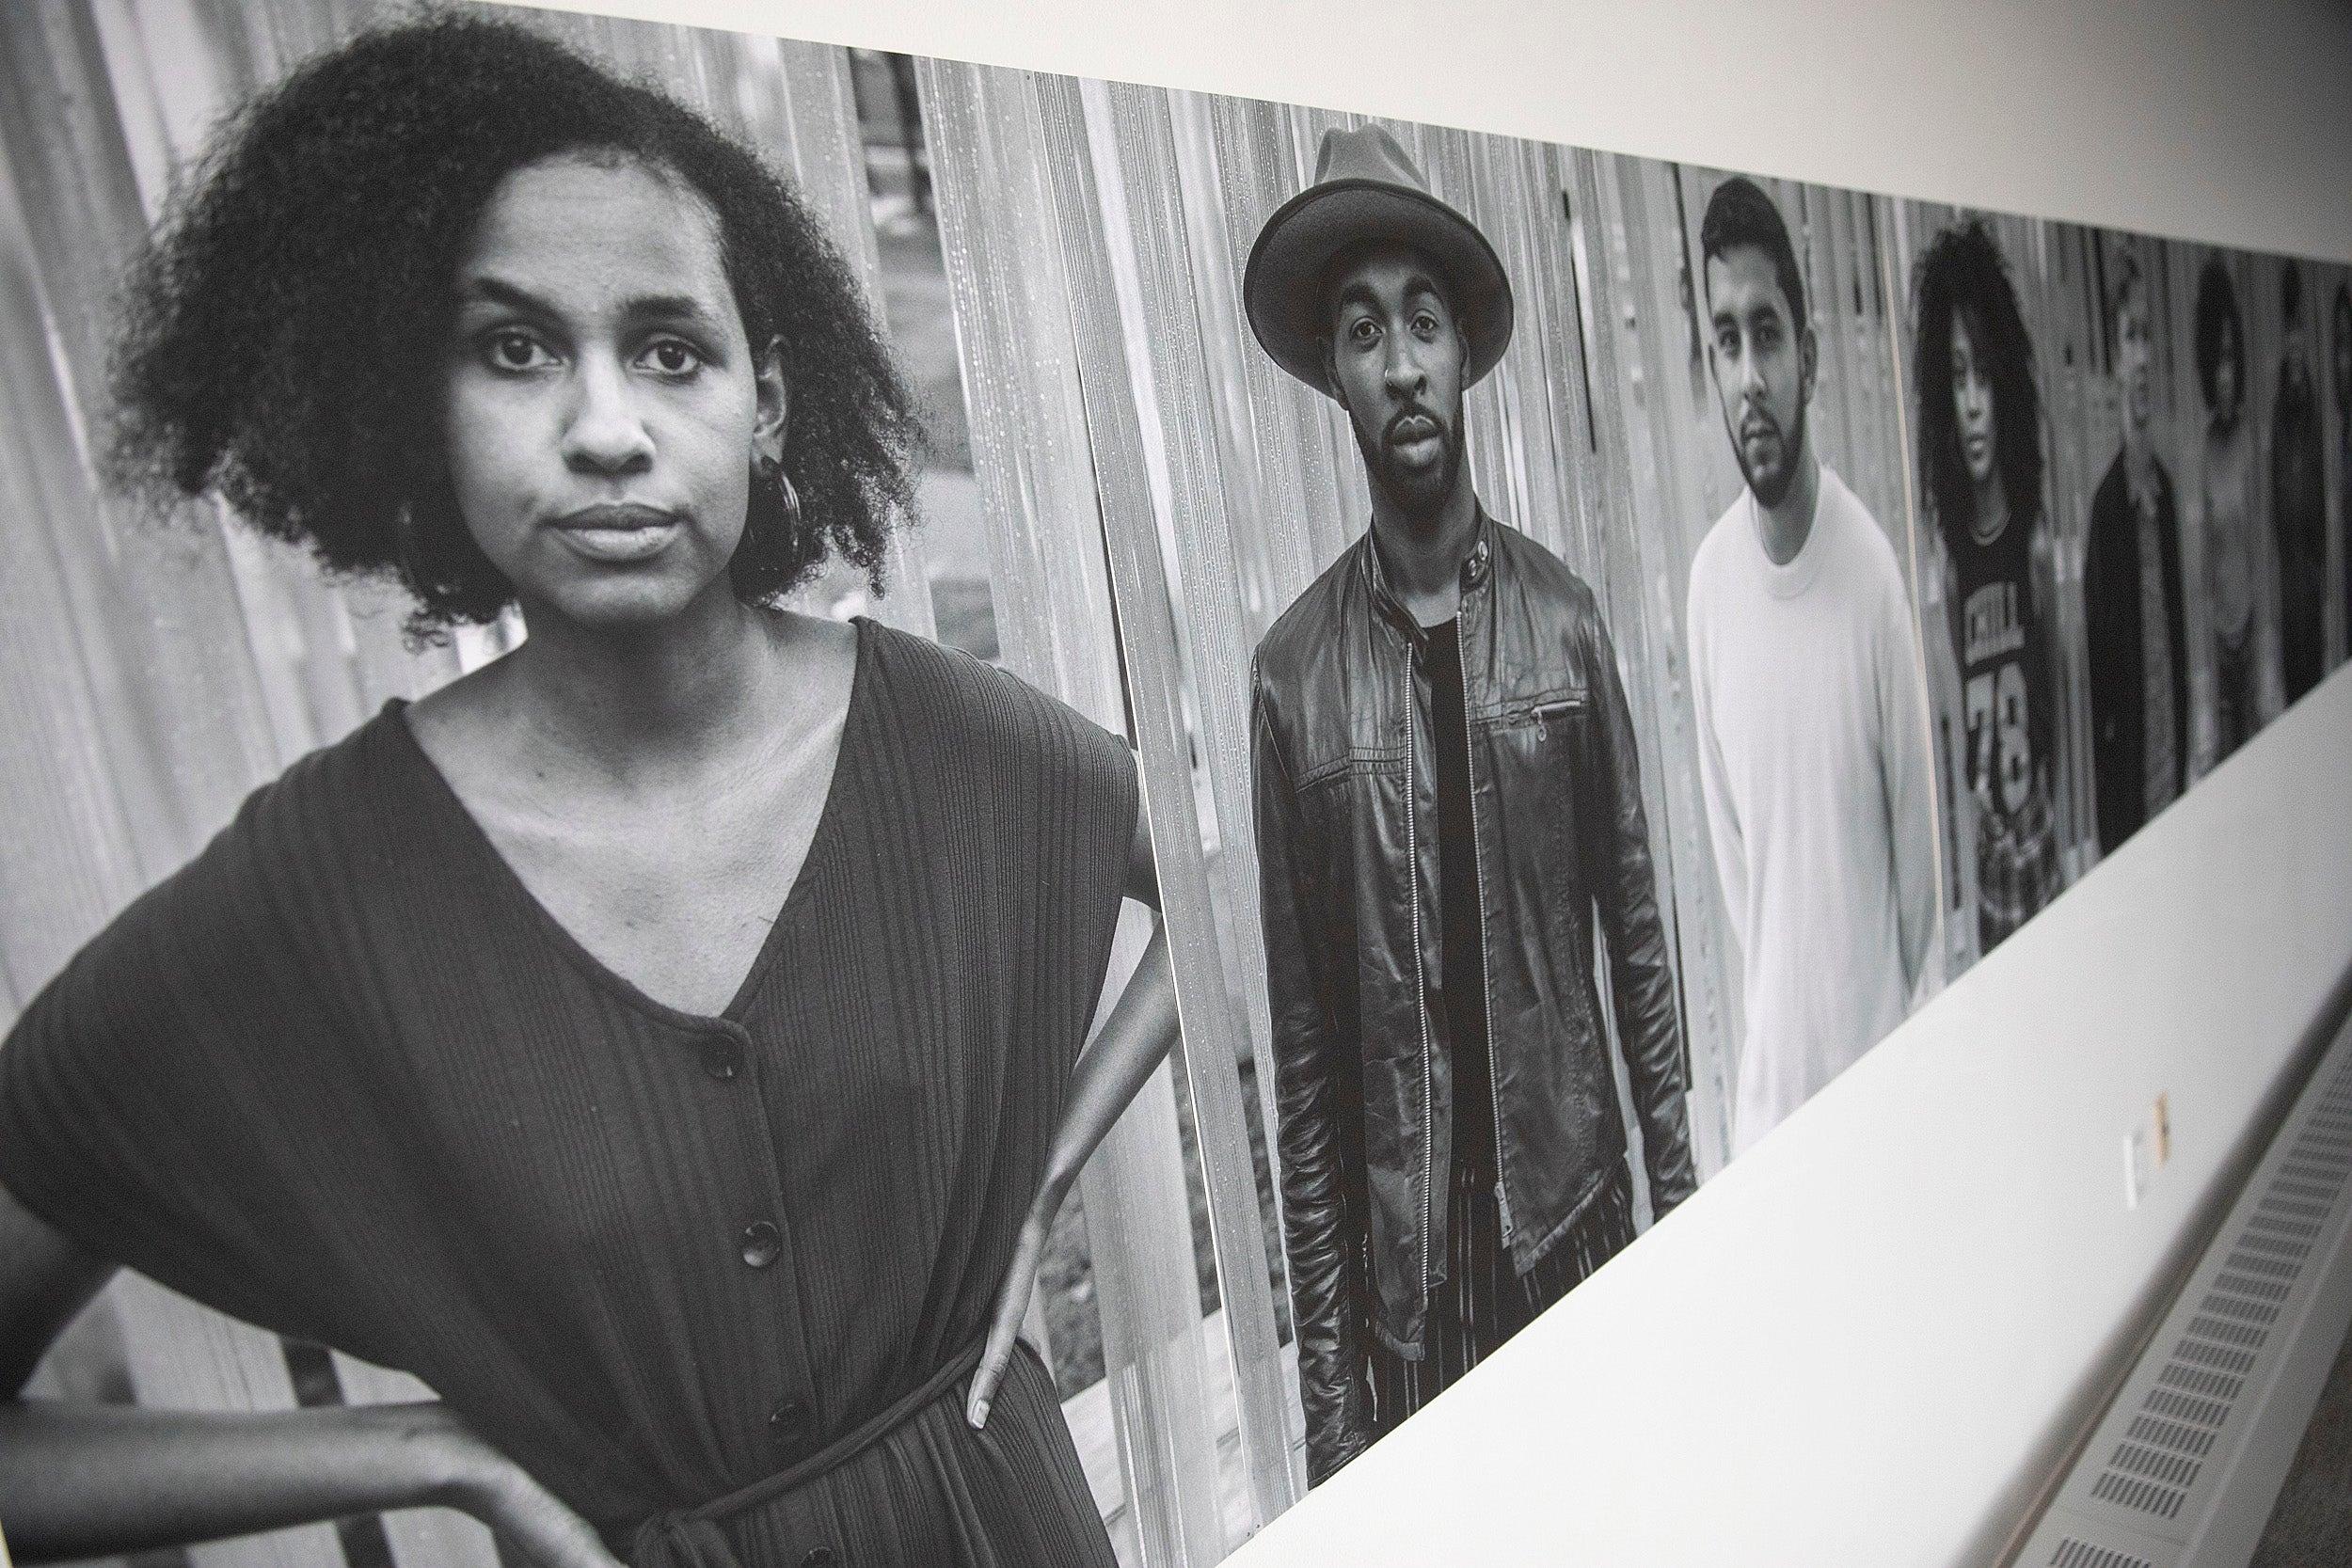 Portraits at the exhibit.